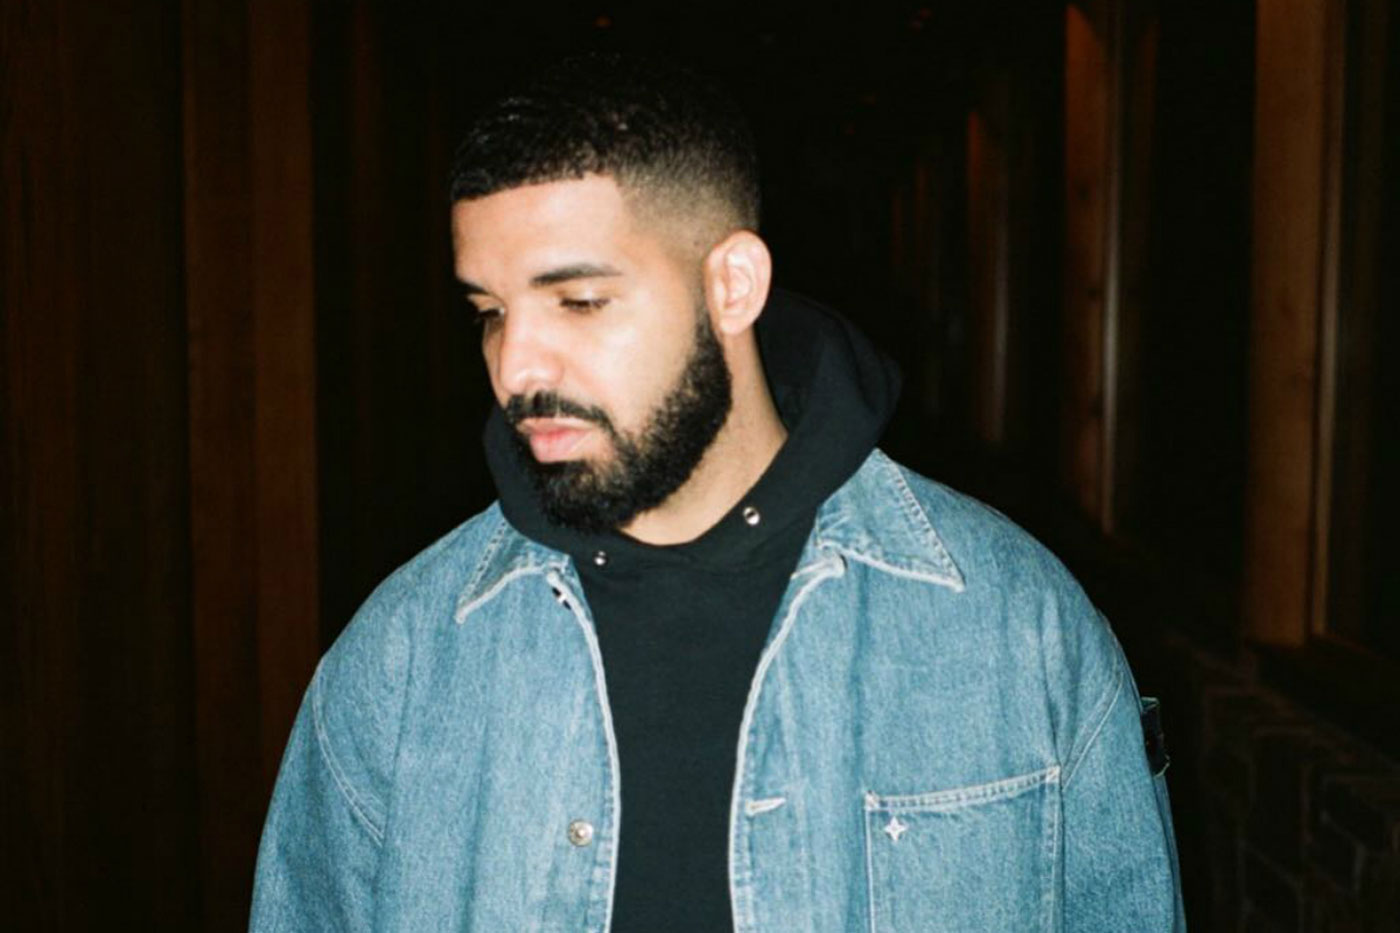 Spotify reembolsa a varios usuarios por la sobredosis de Drake